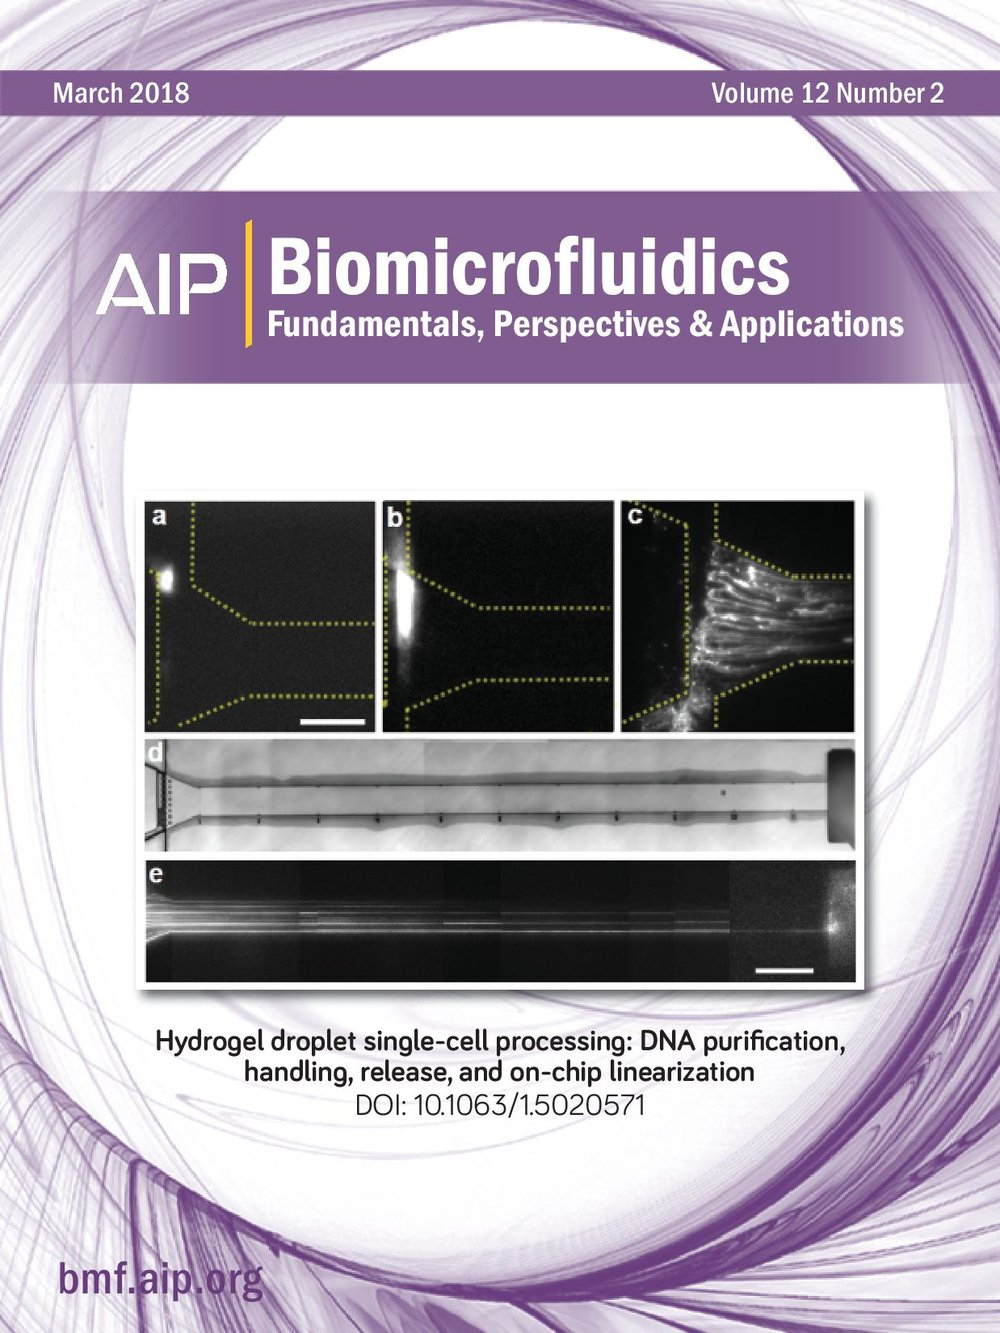 Zimny-Biomicrofluidics Front Page.jpg